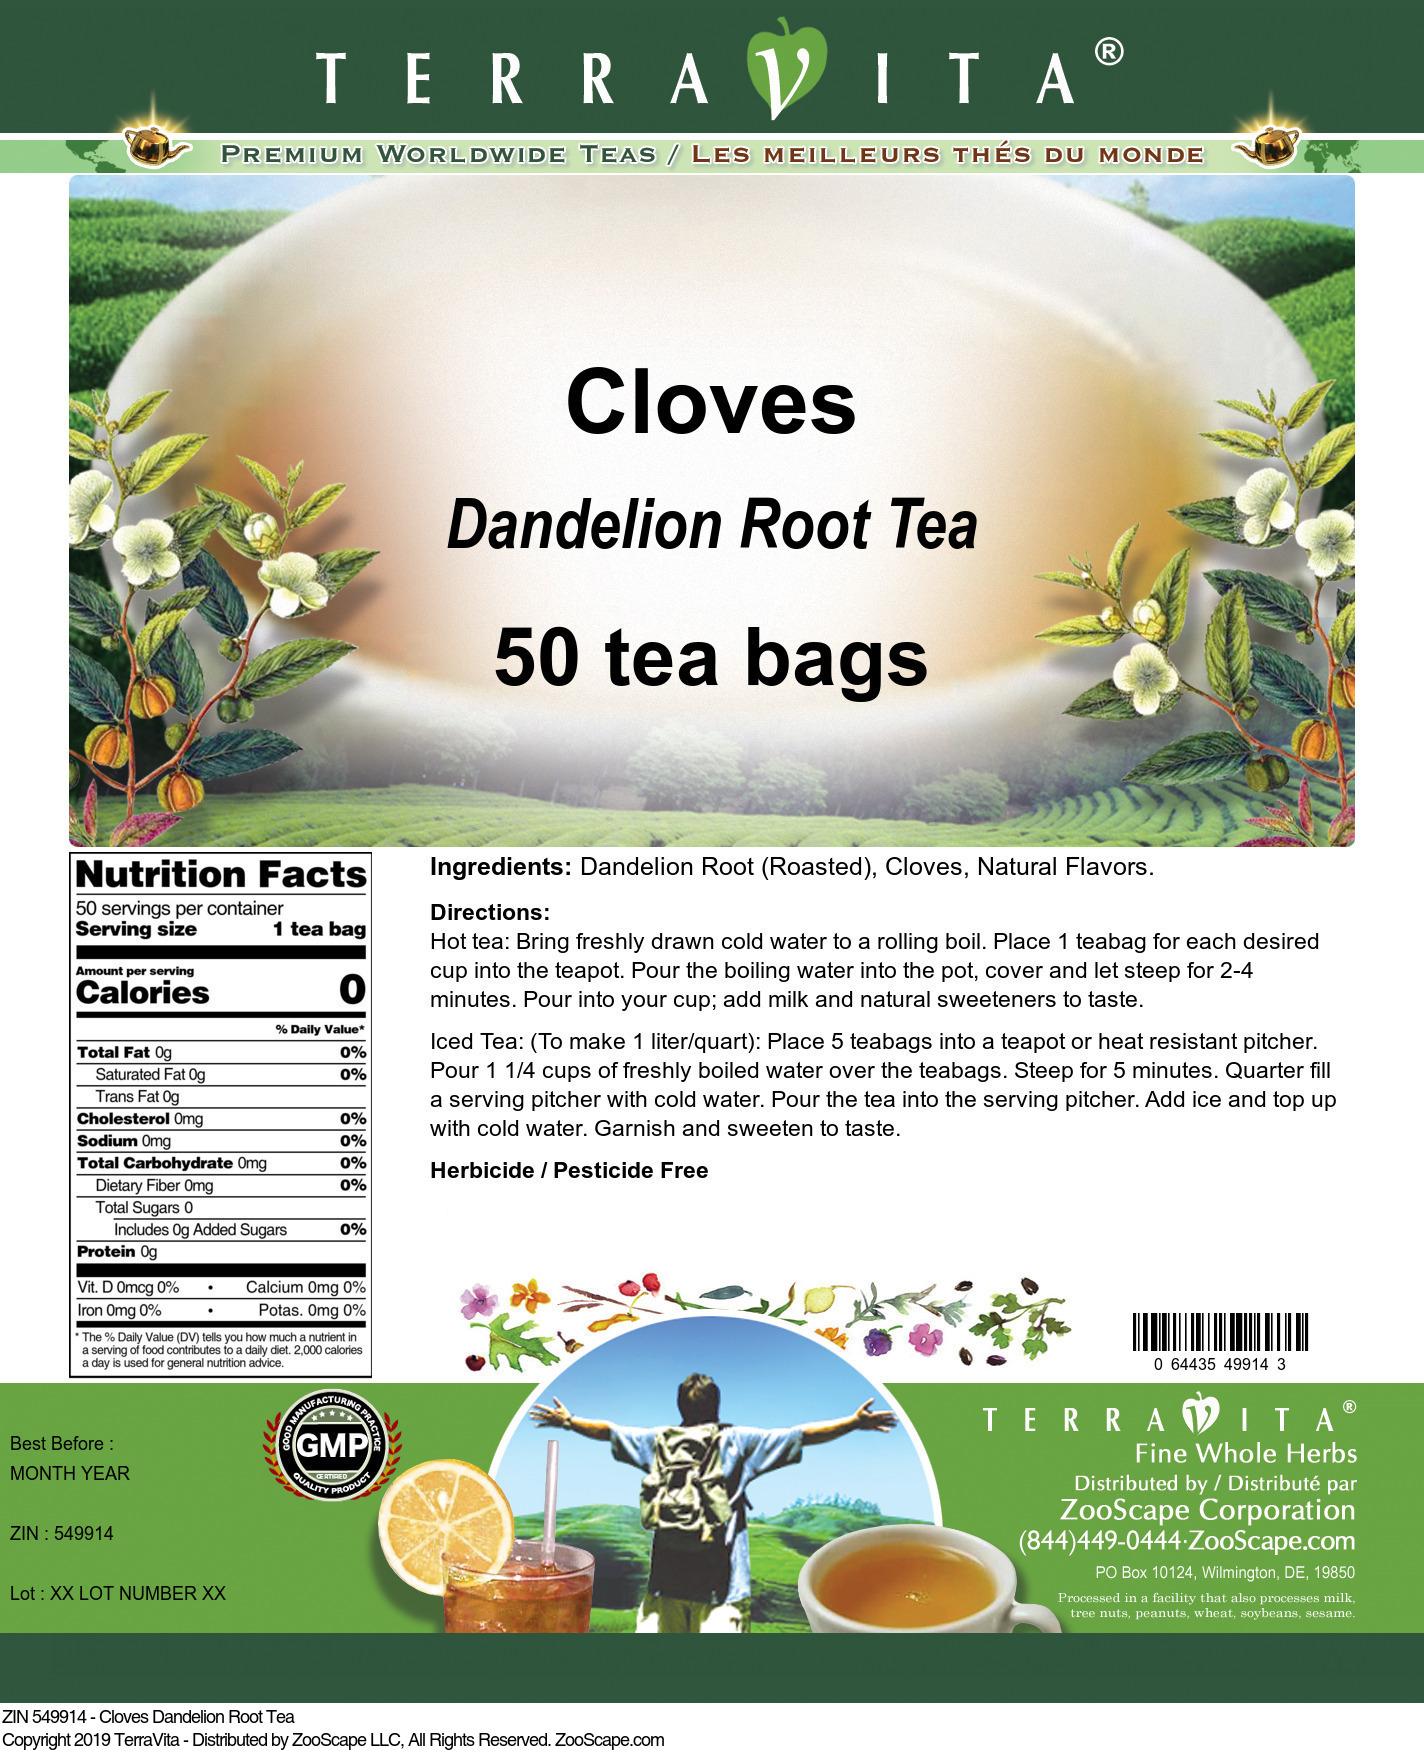 Cloves Dandelion Root Tea